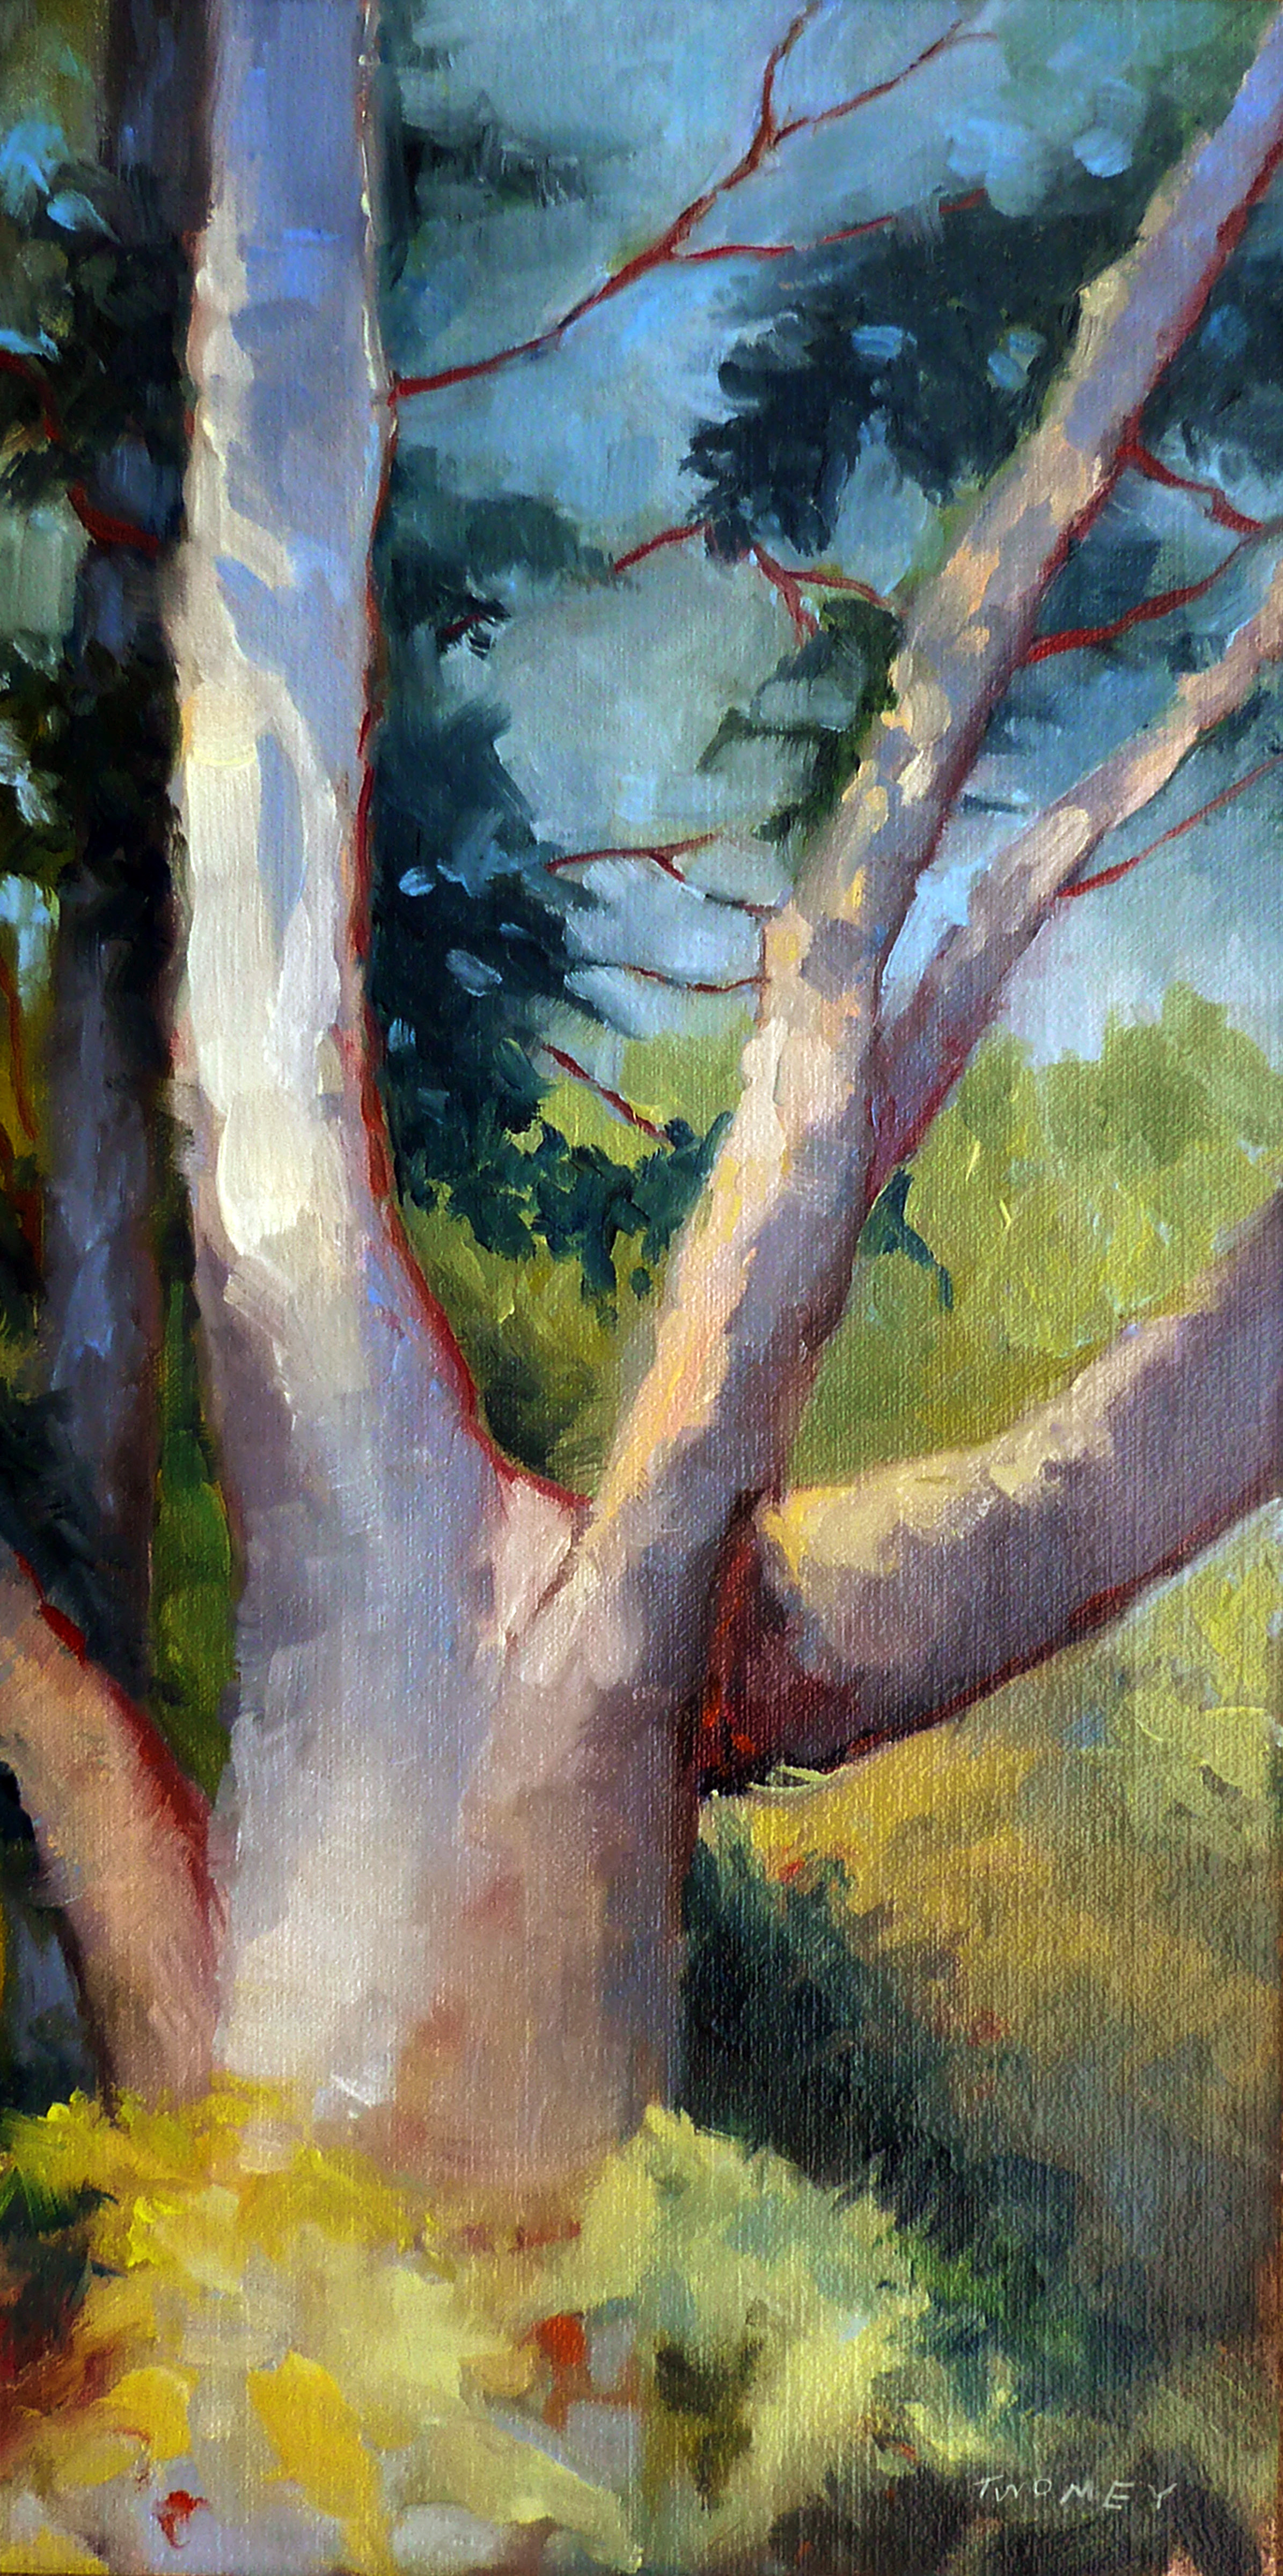 """Massive Summer Oak"" 16"" X 8"", Catherine Twomey"